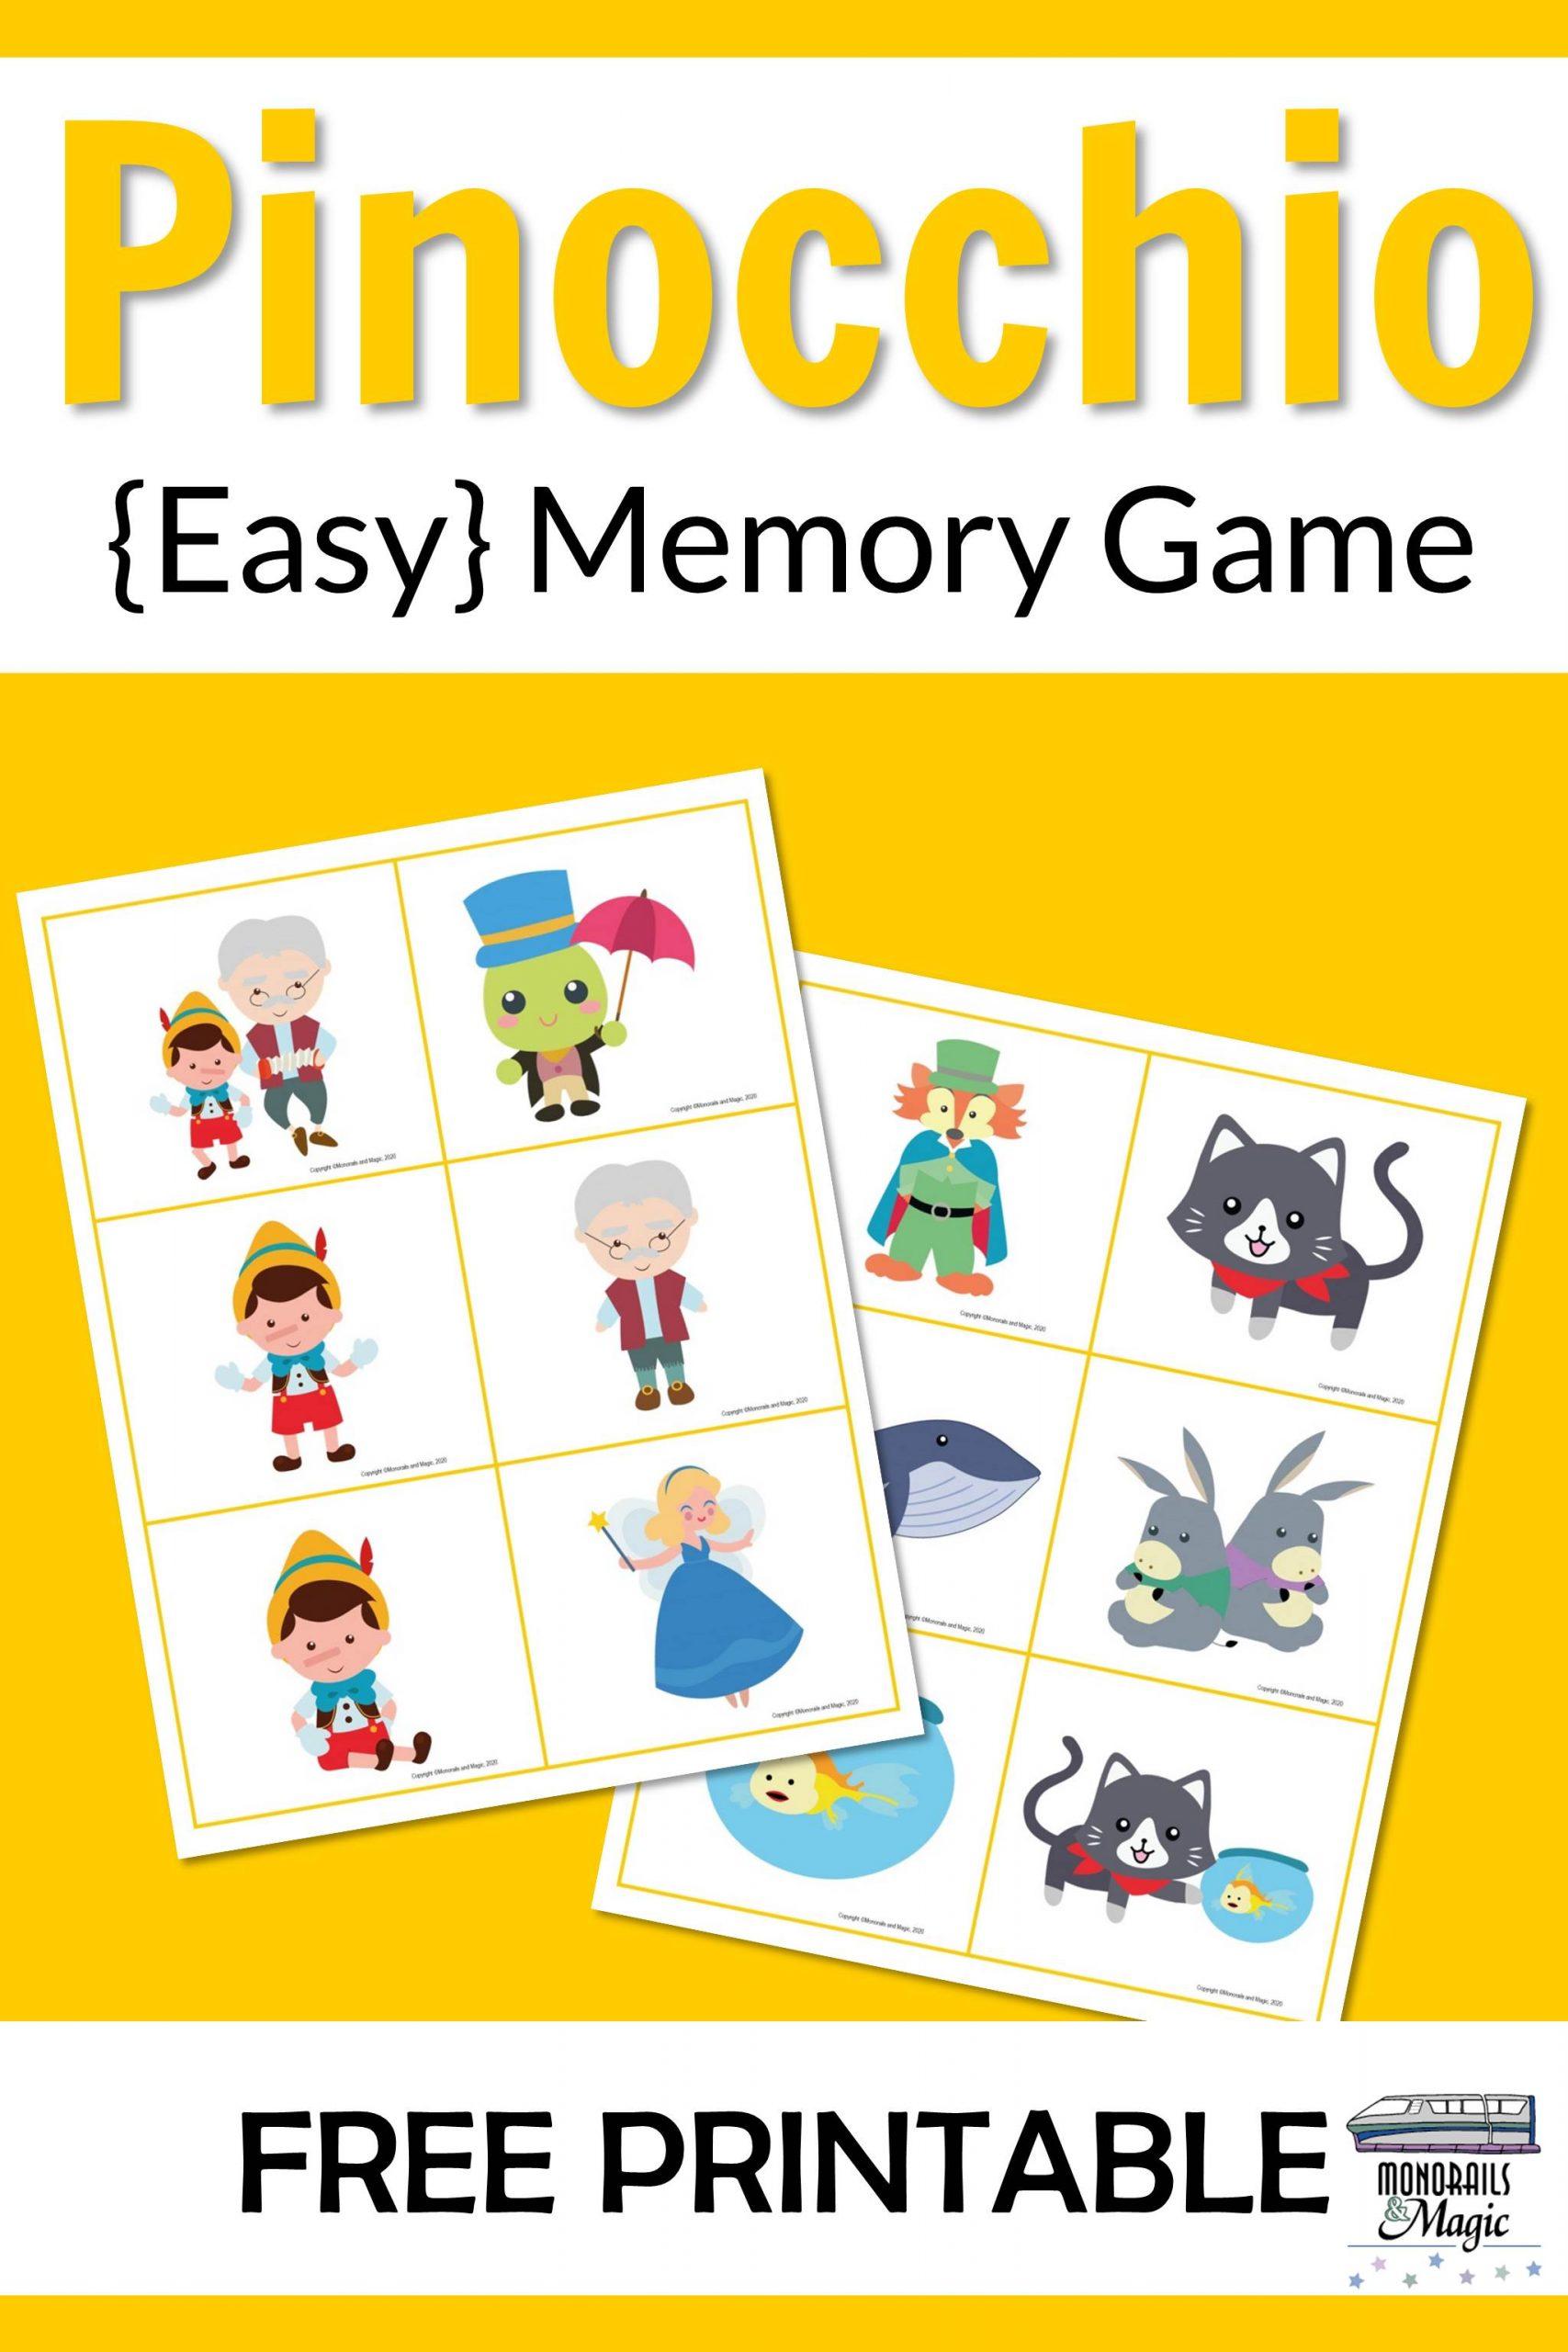 Pinocchio Memory Game Free Printable